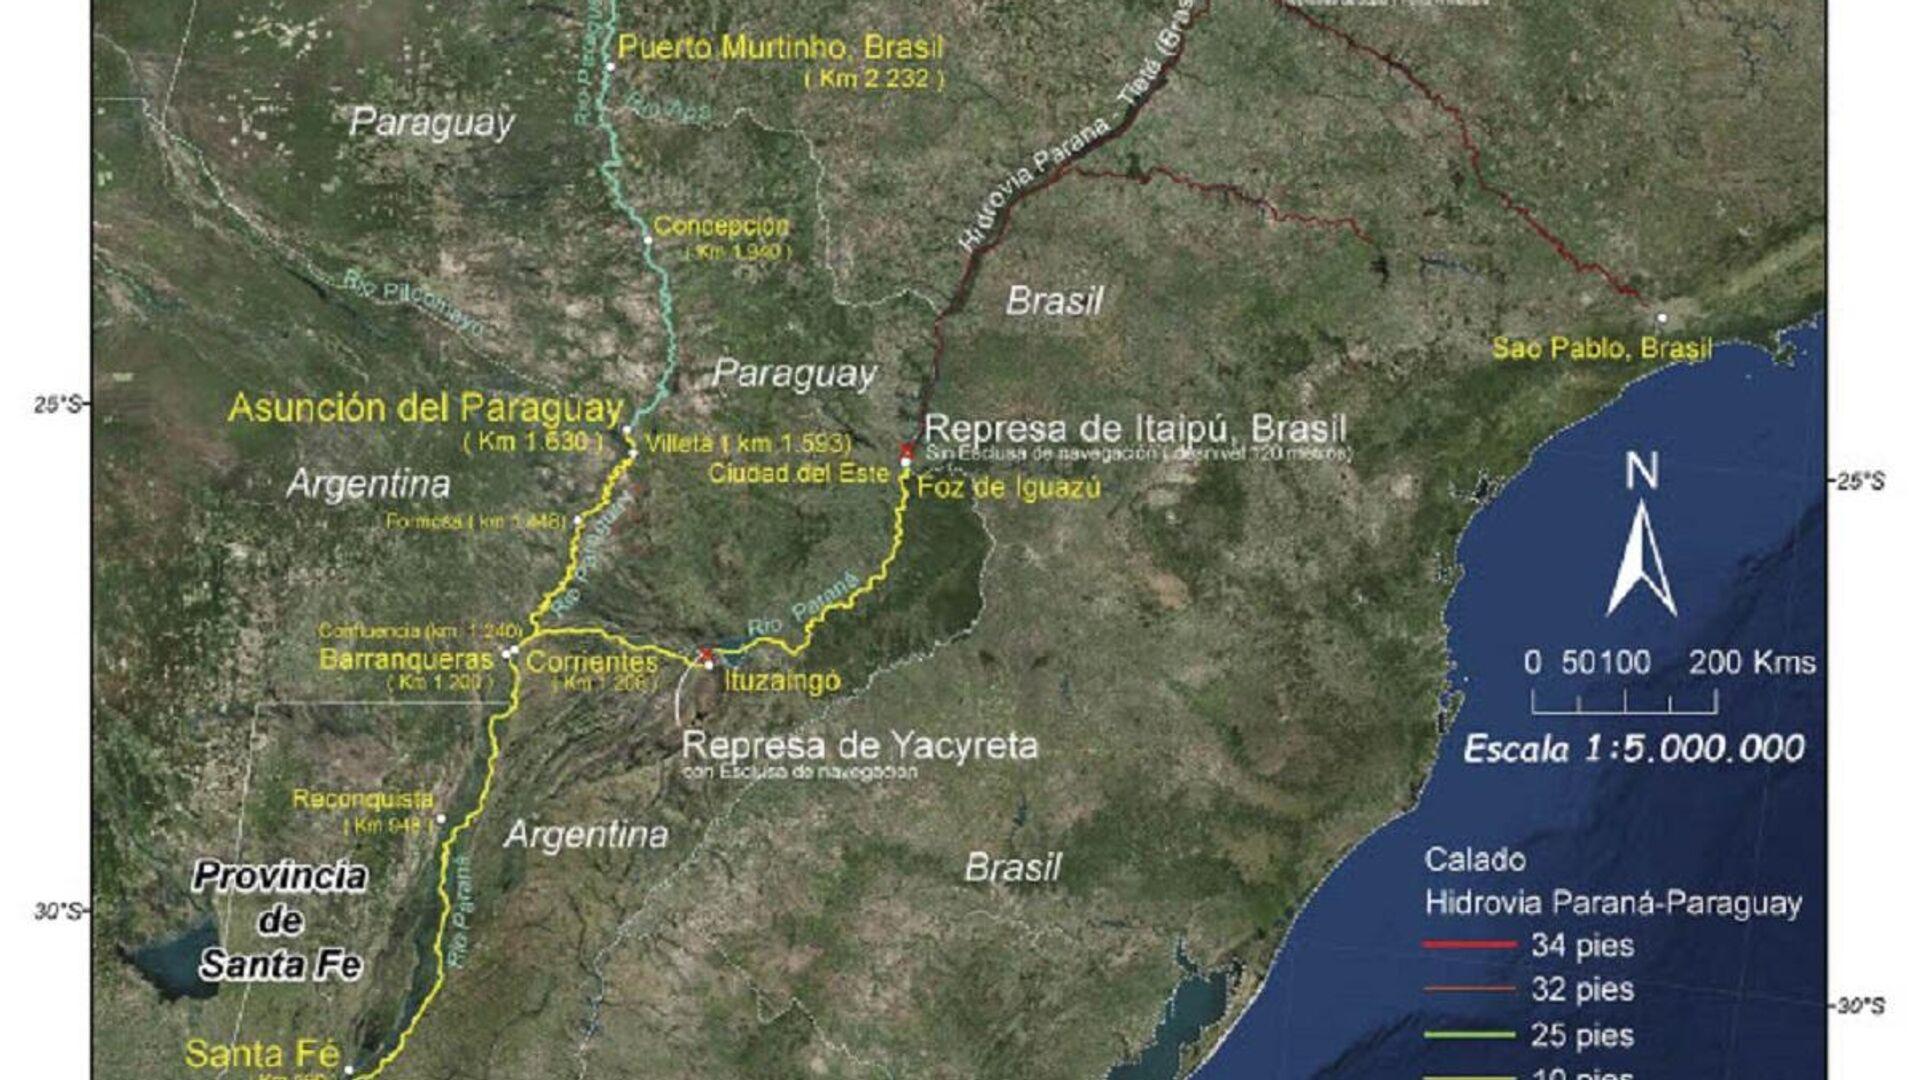 Mapa de la Hidrovía Paraná - Paraguay - Sputnik Mundo, 1920, 10.04.2021